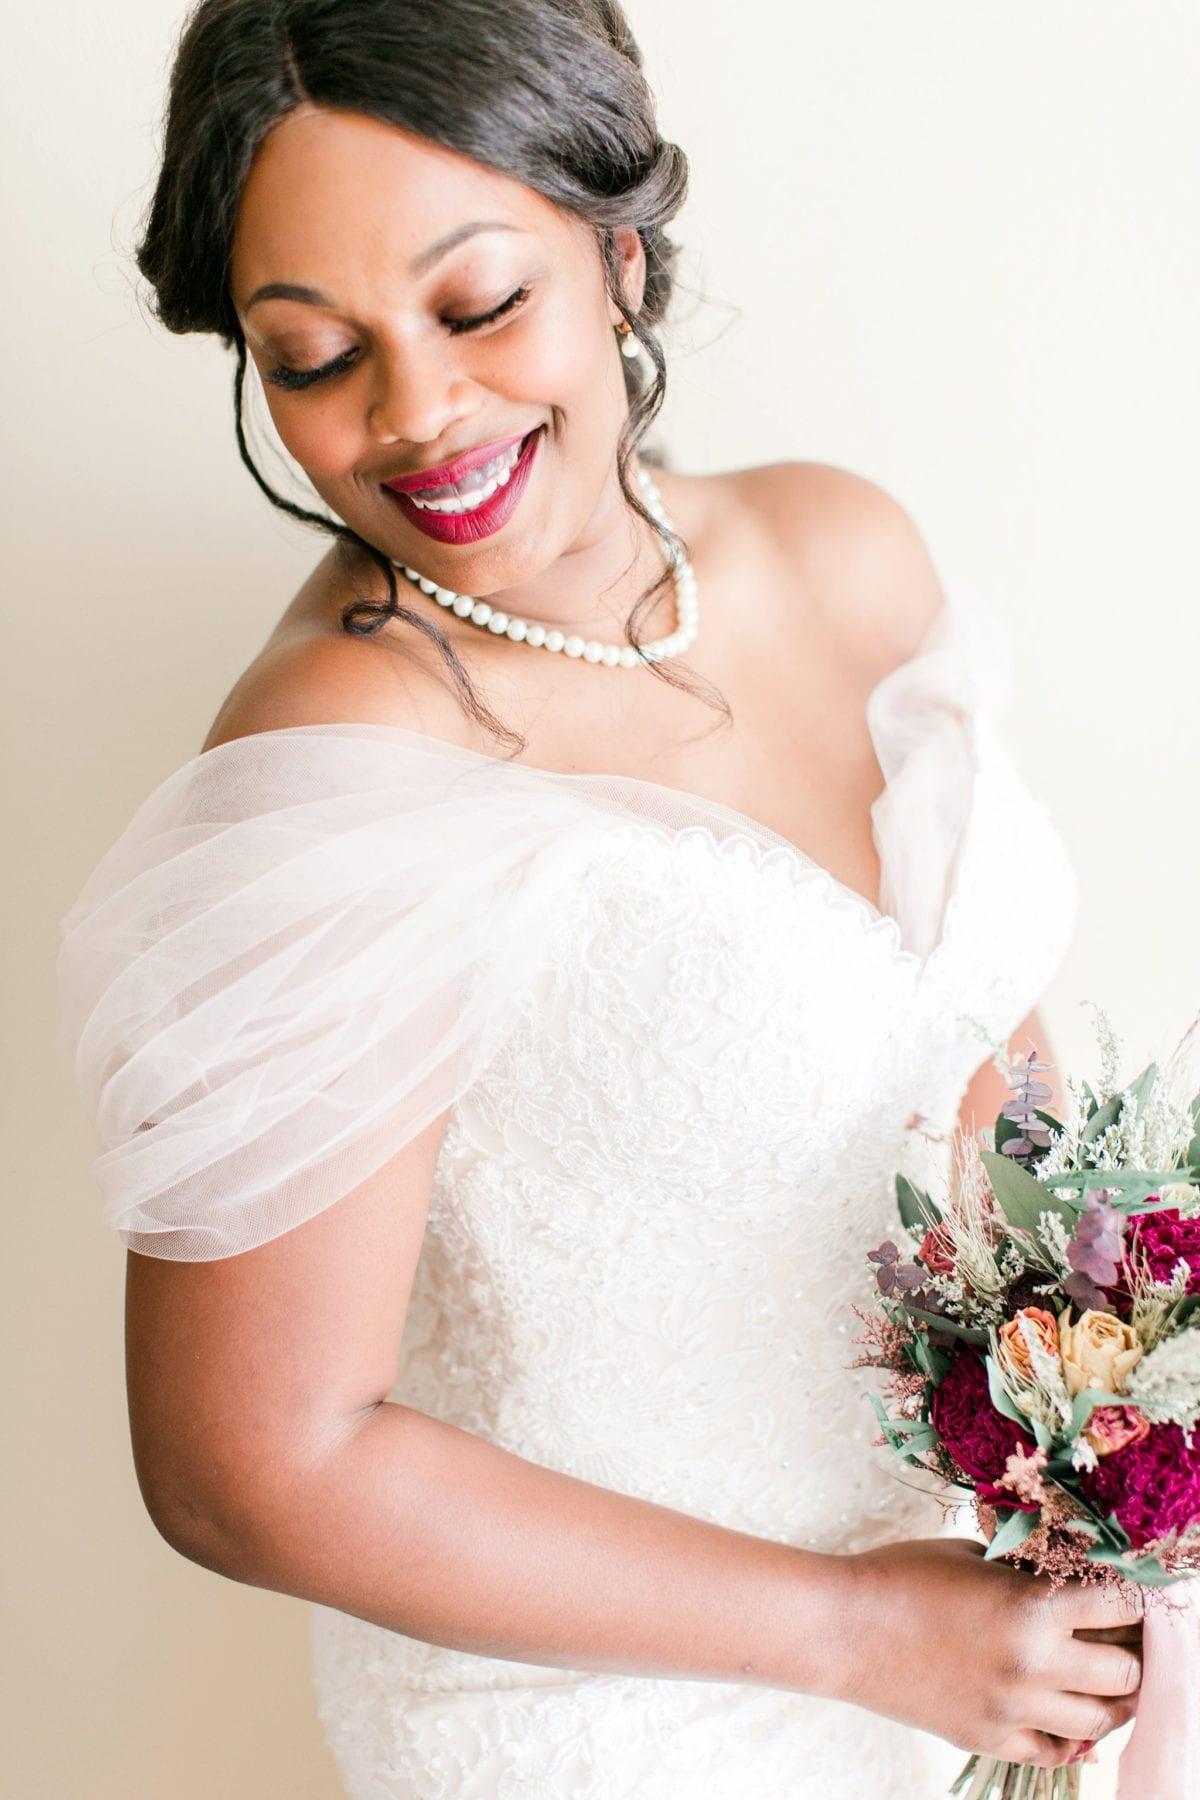 Jefferson Patterson Park Wedding Maryland Wedding Photographer Megan Kelsey Photography Jasmine & Seyi-27.jpg